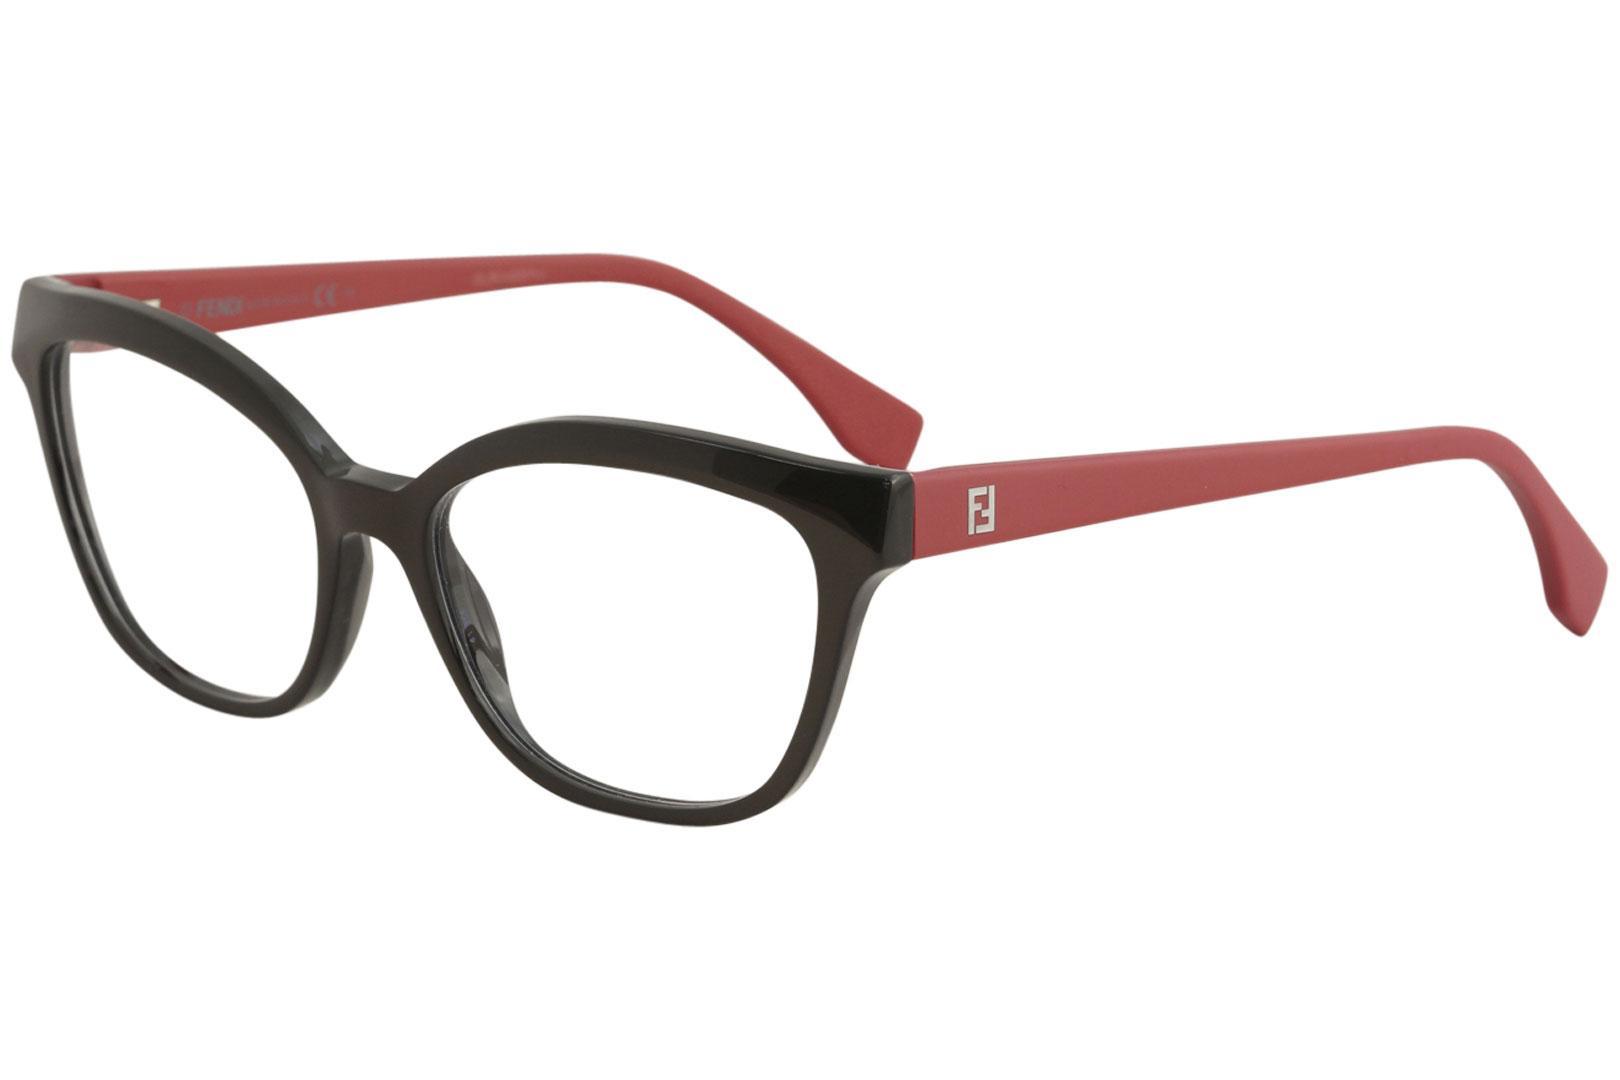 51437fd89e24 Fendi Eyeglasses Frames - Image Decor and Frame Worldwebresource.Org